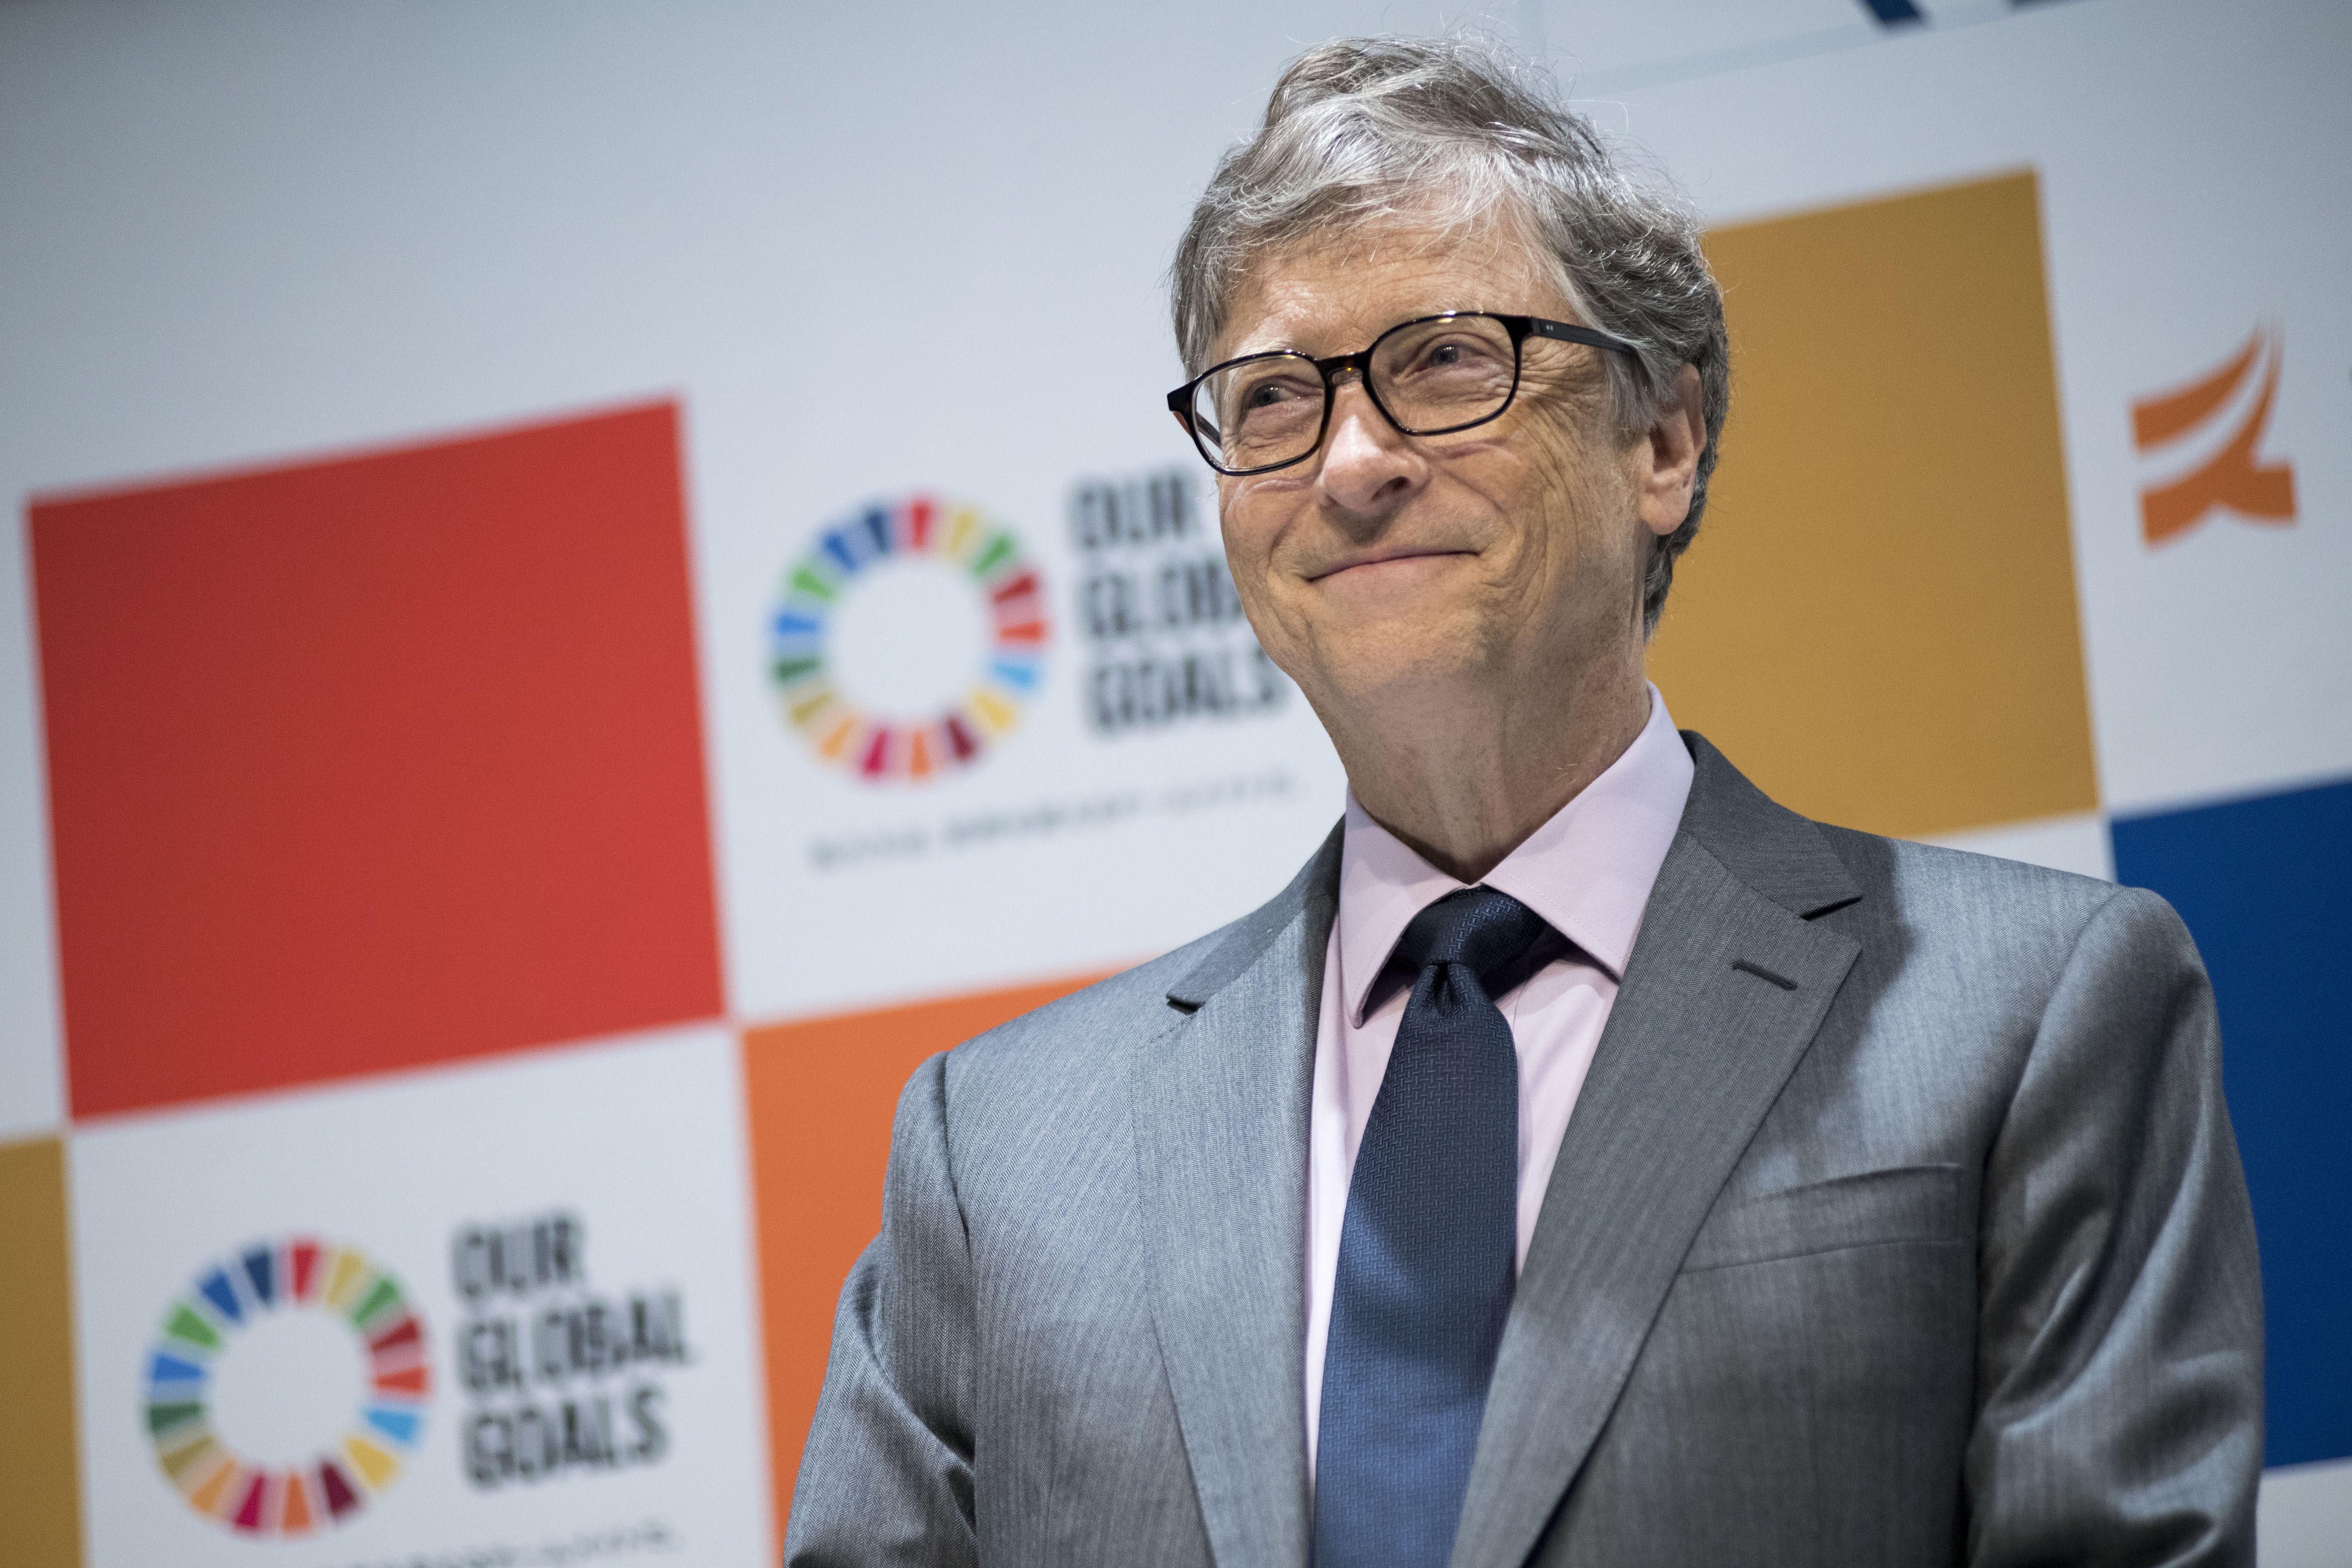 Bill Gates Says His 'Greatest Mistake Ever' Cost Microsoft $400 Billion